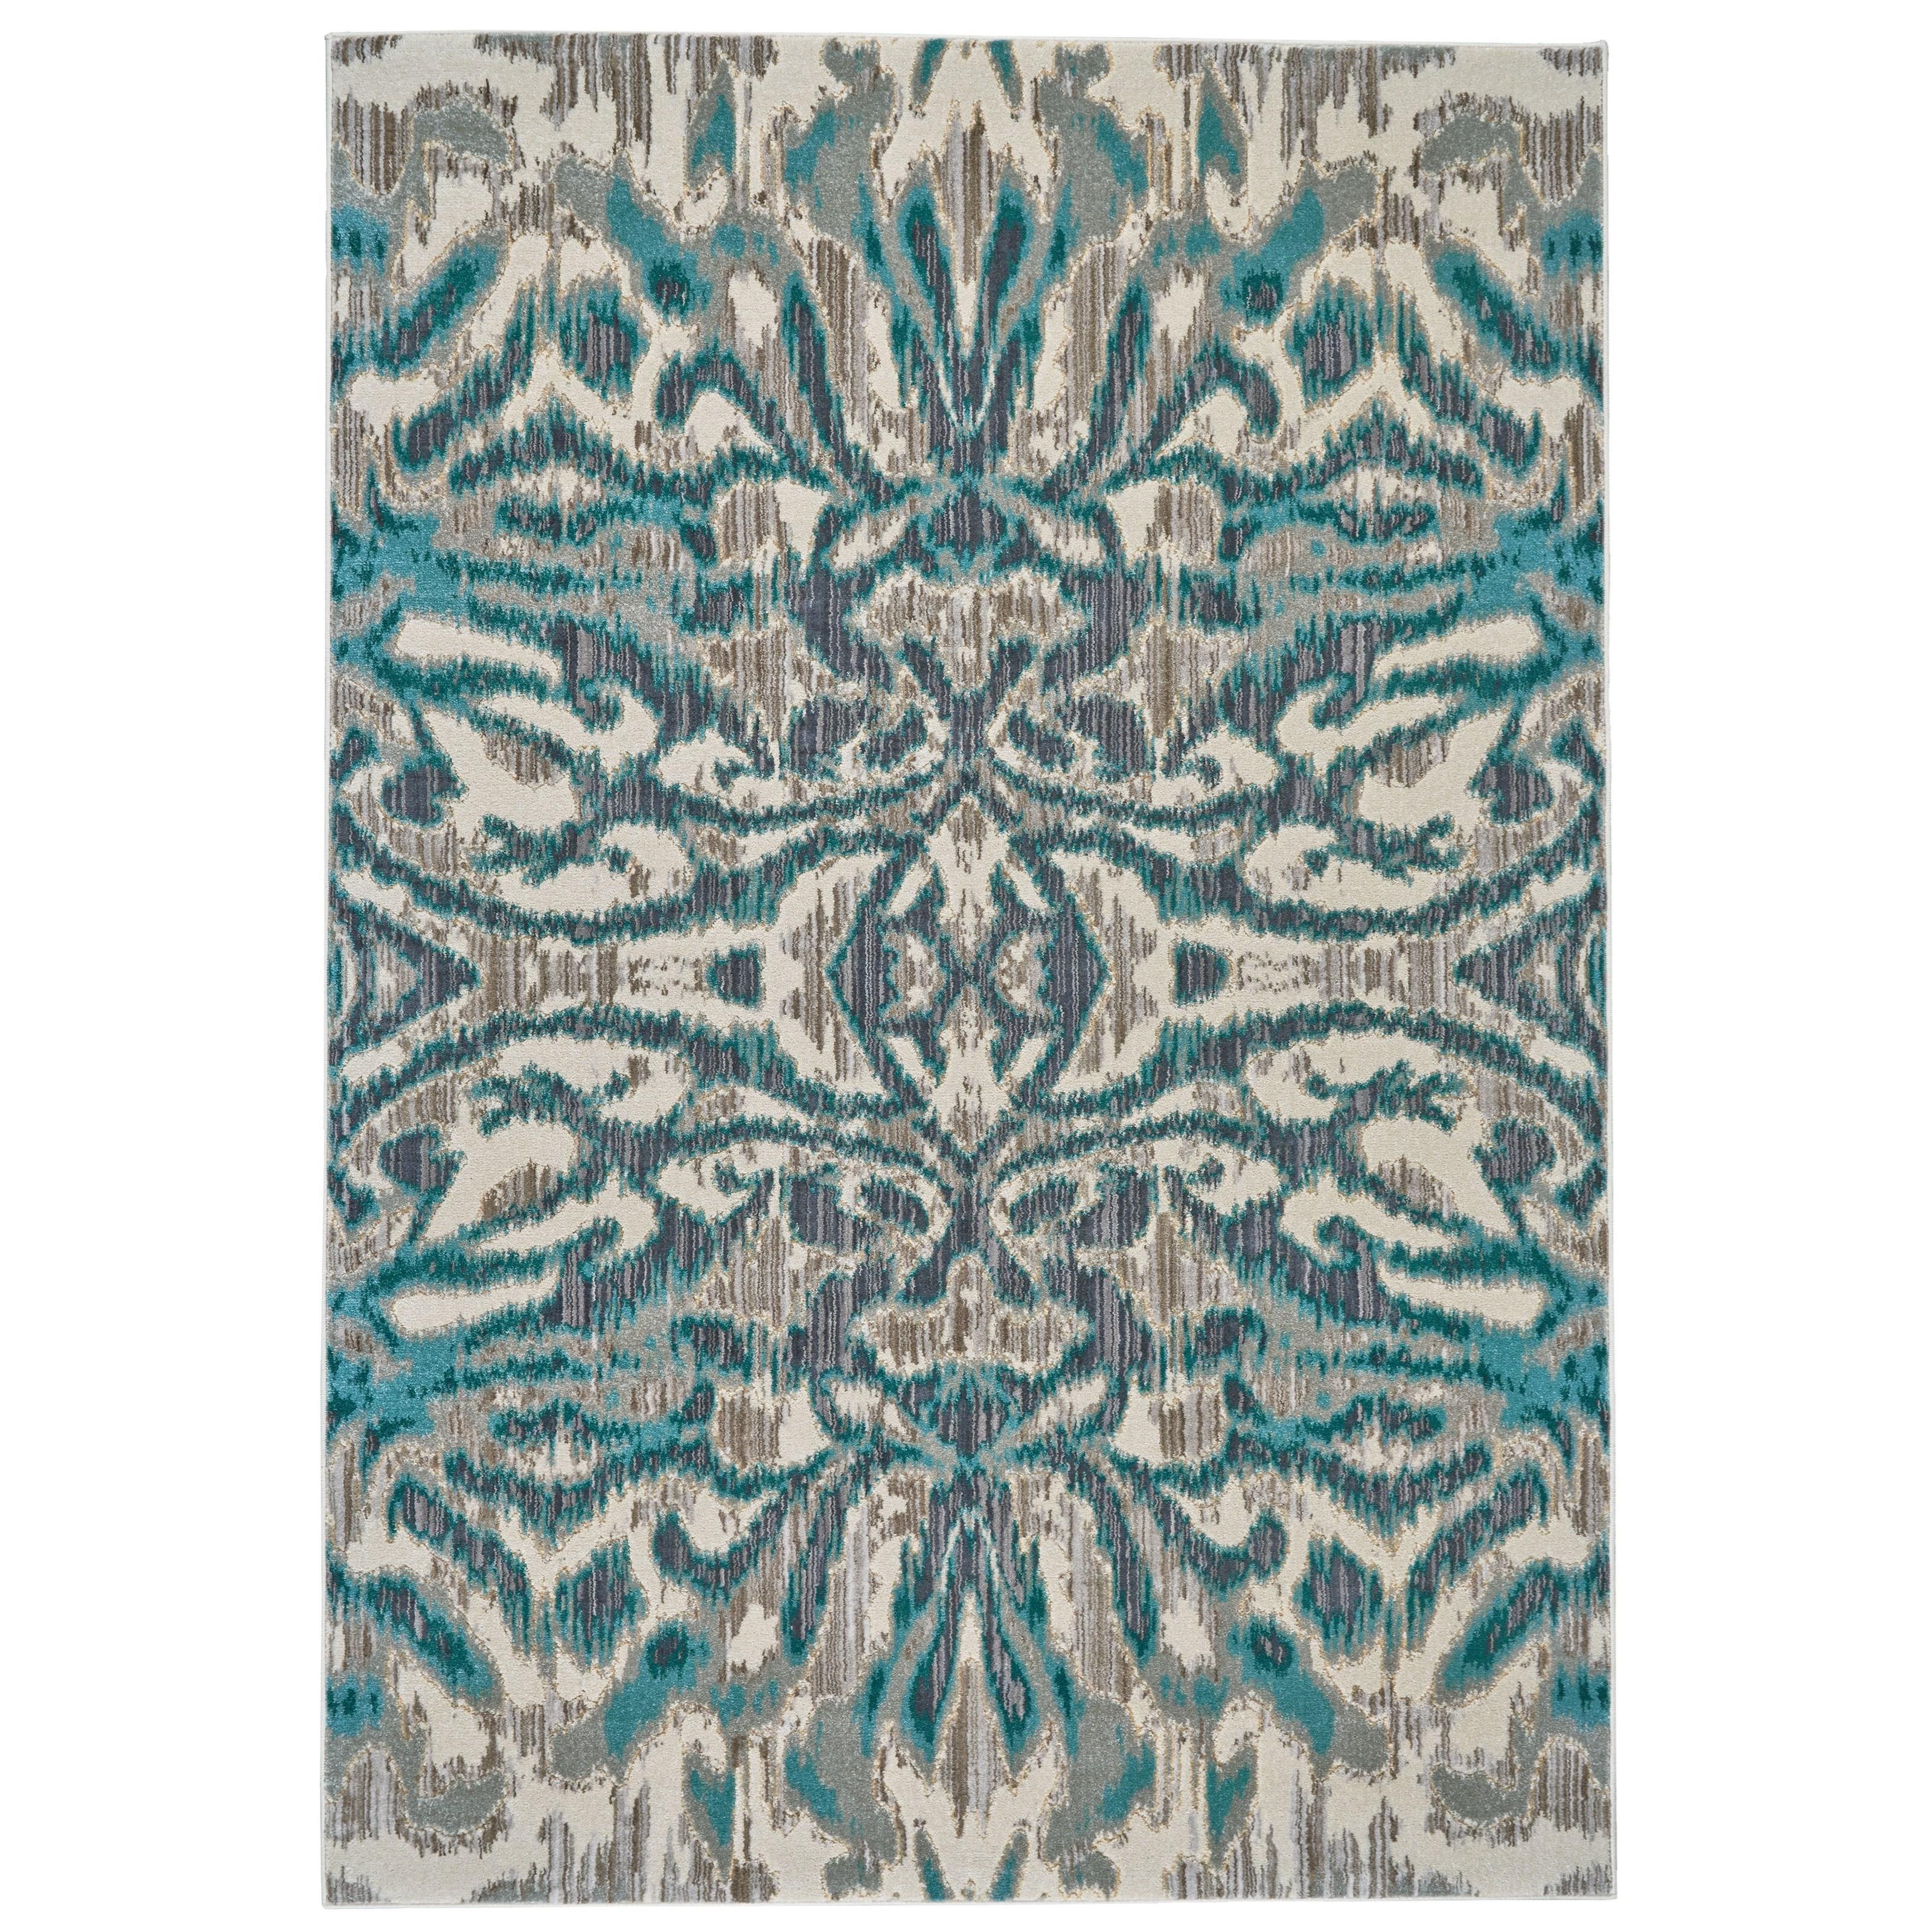 "Keats Aqua/Haze 2'-2"" x 4' Area Rug by Feizy Rugs at Sprintz Furniture"